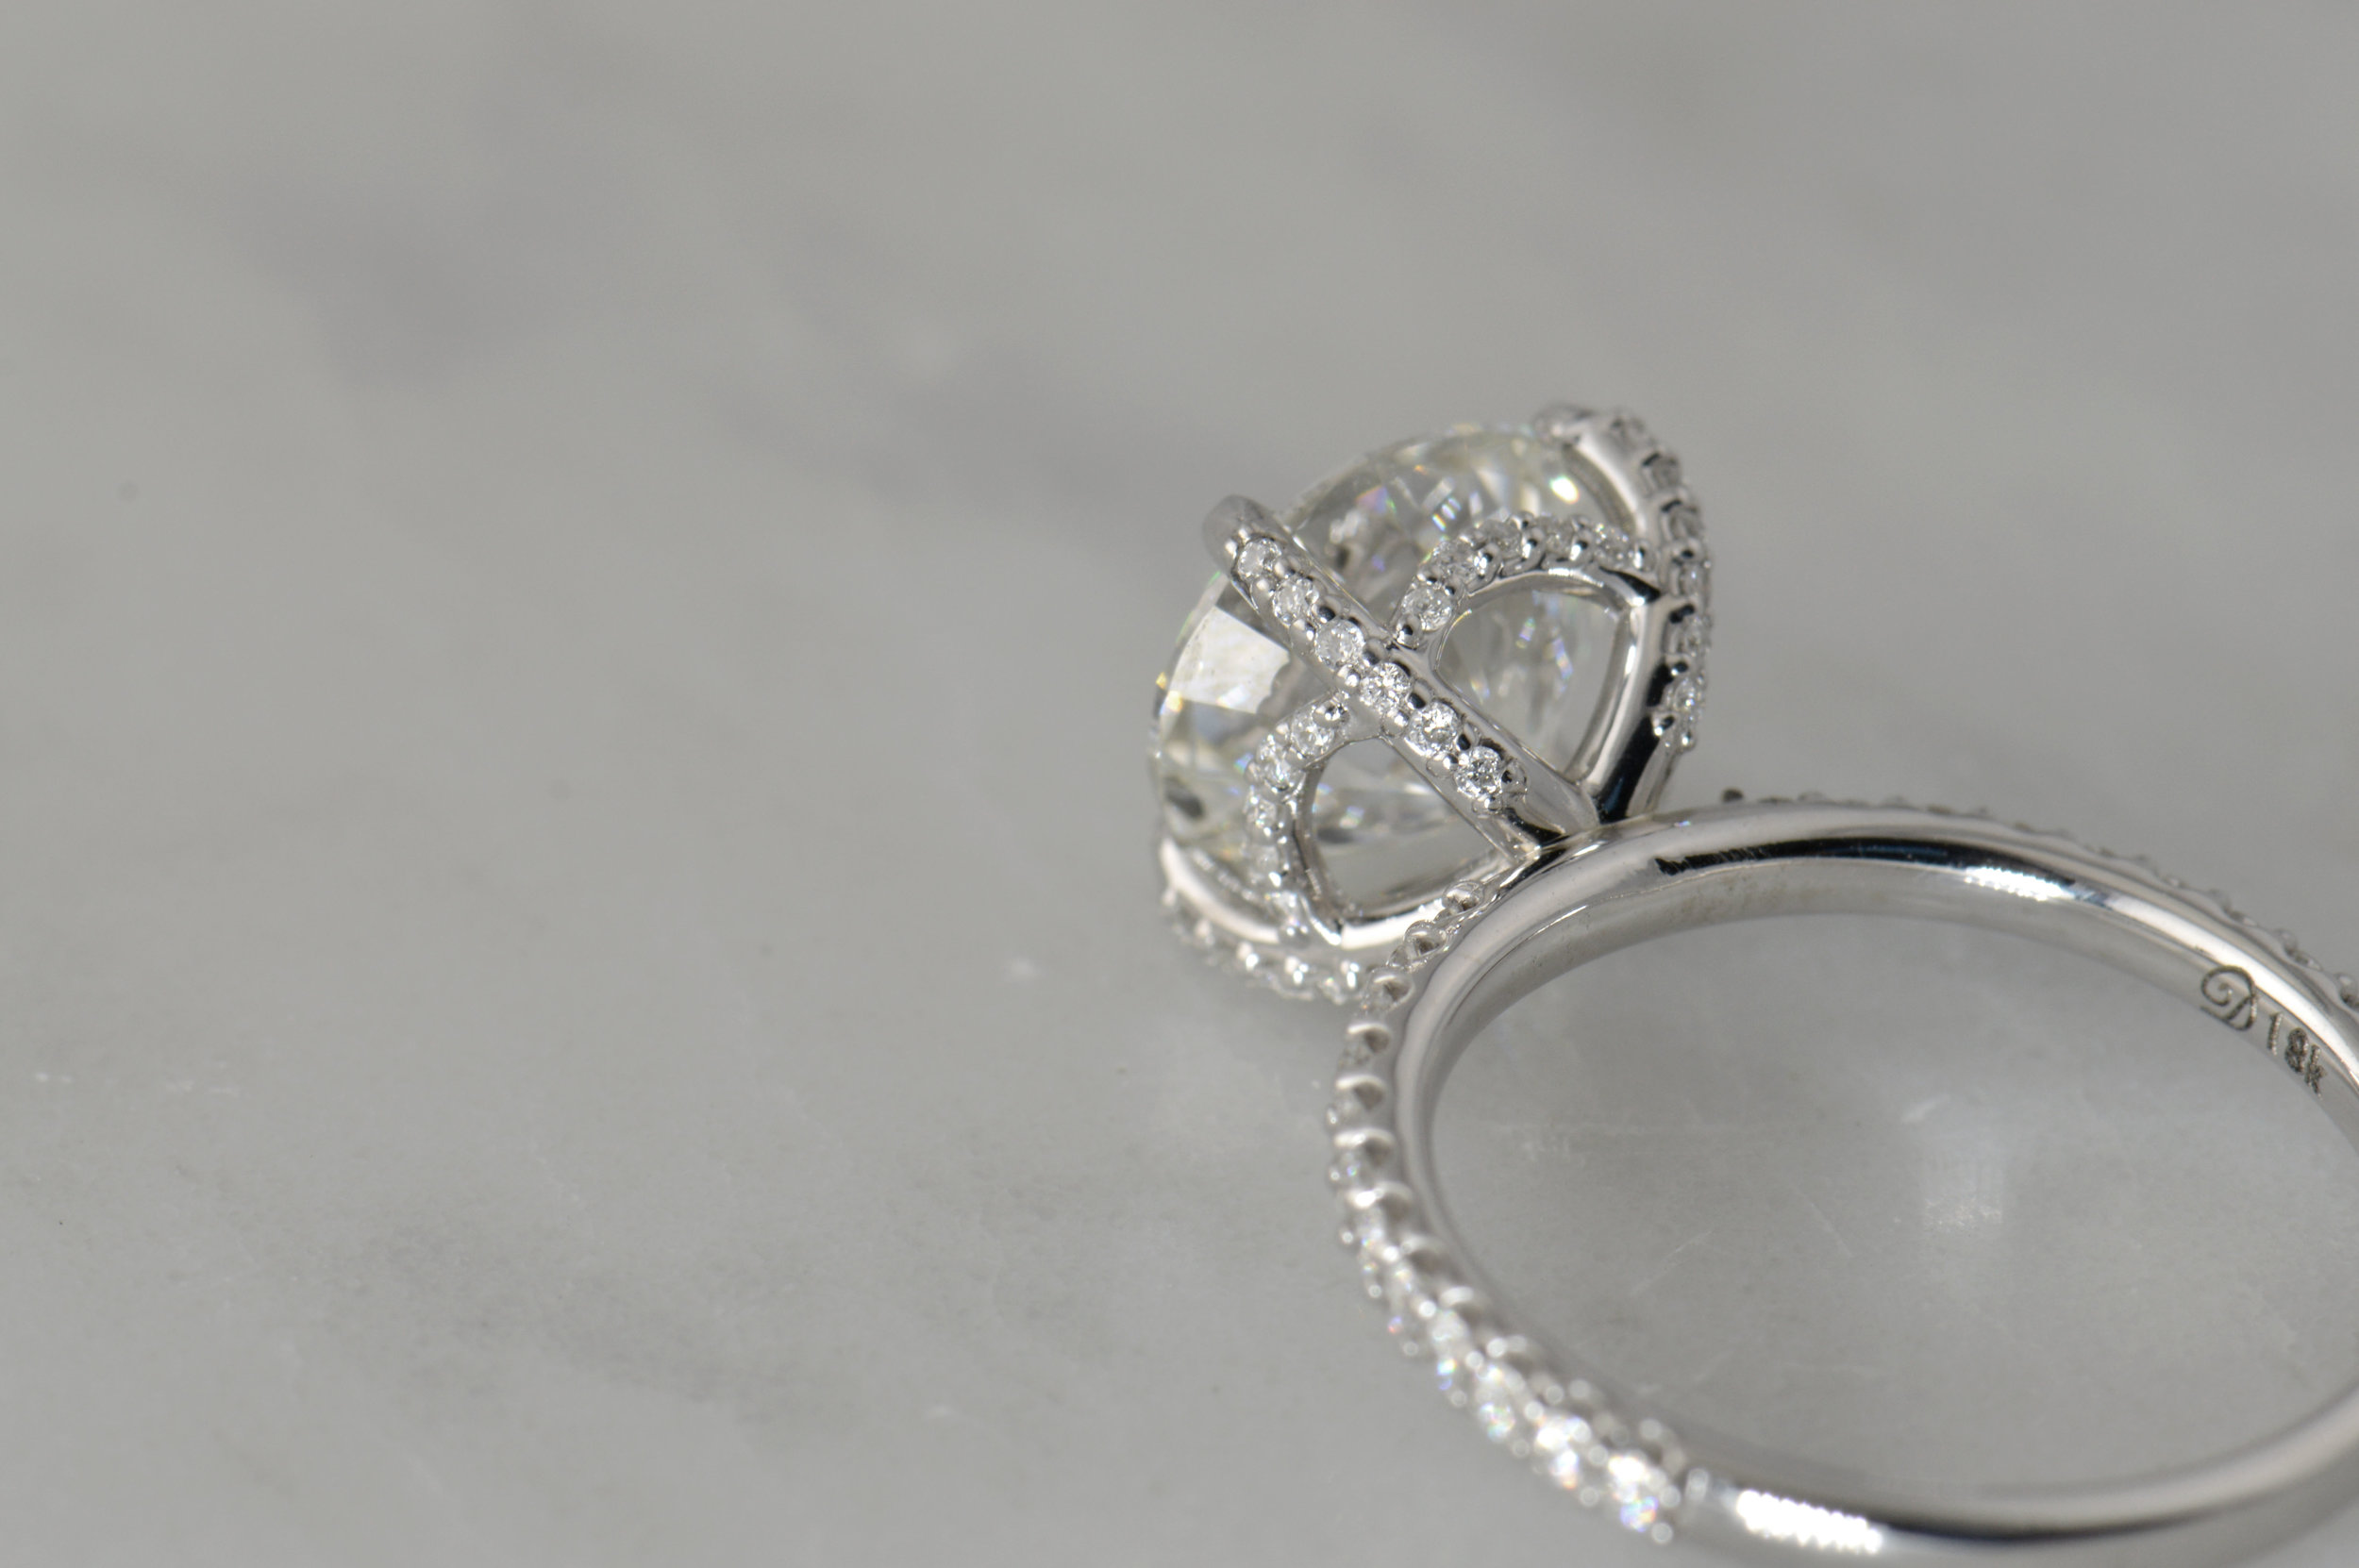 darvier-diamond-engagement-pave-thin-18k.JPG